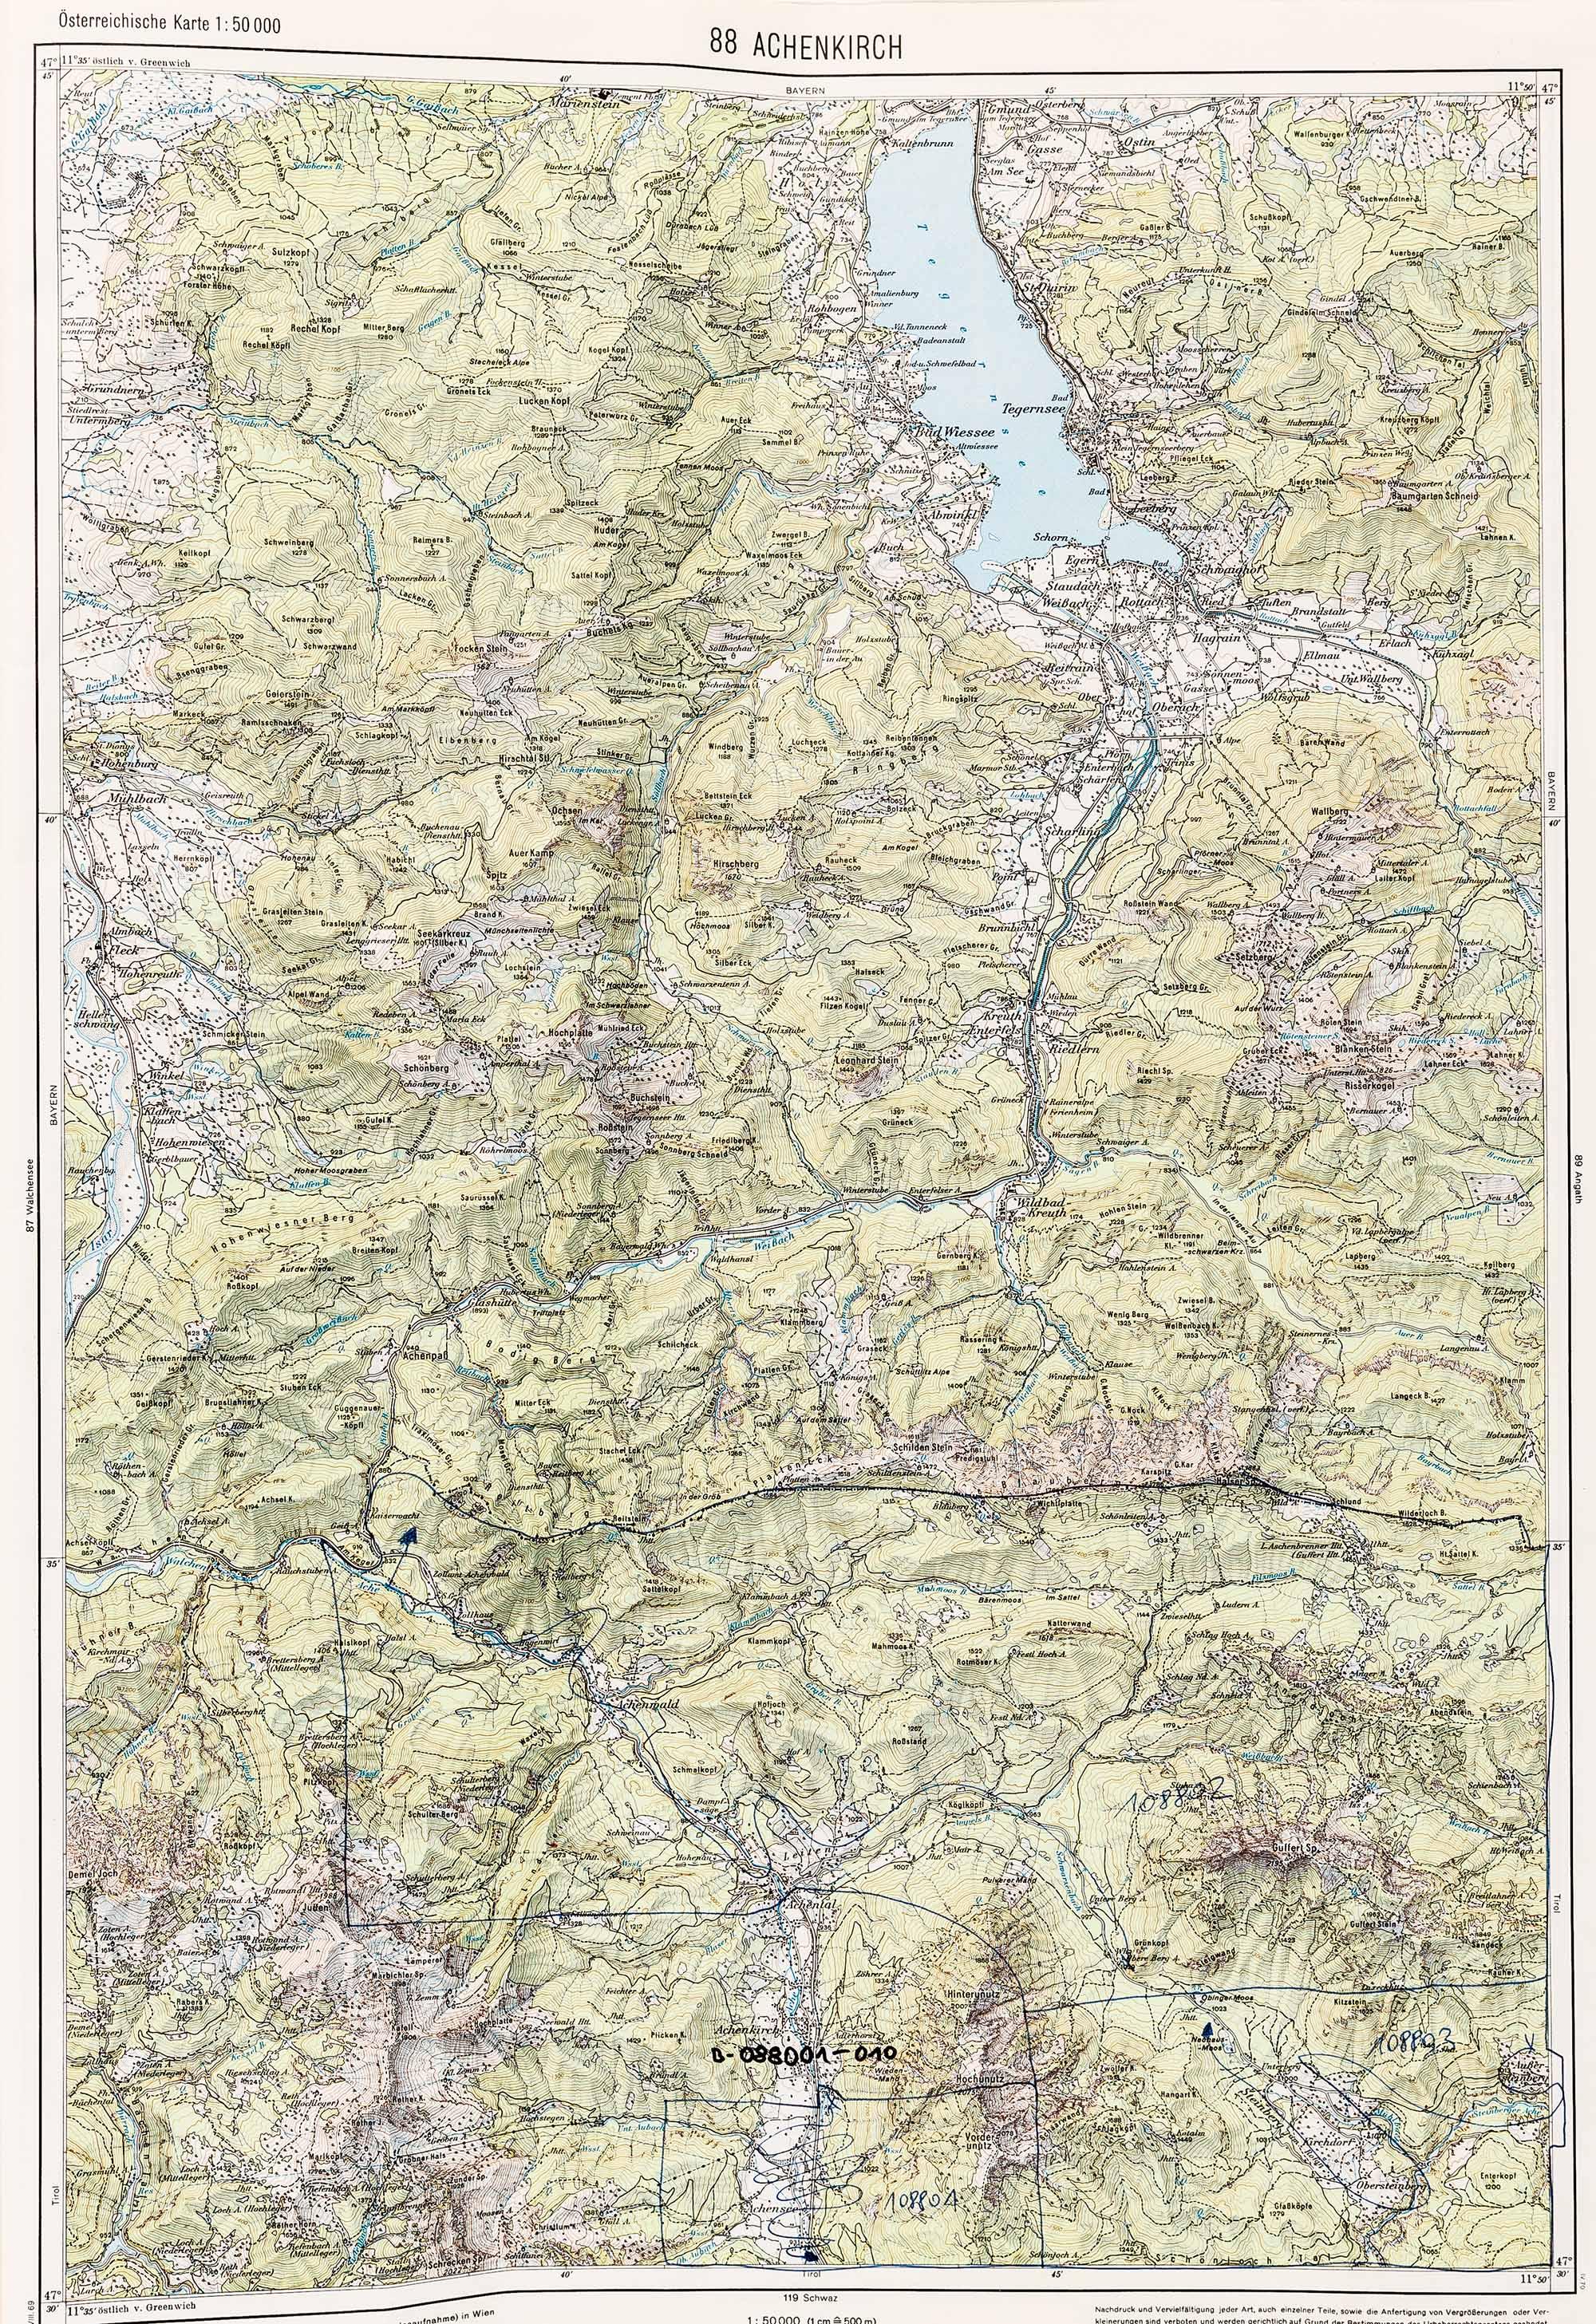 1979-1982 Karte 088